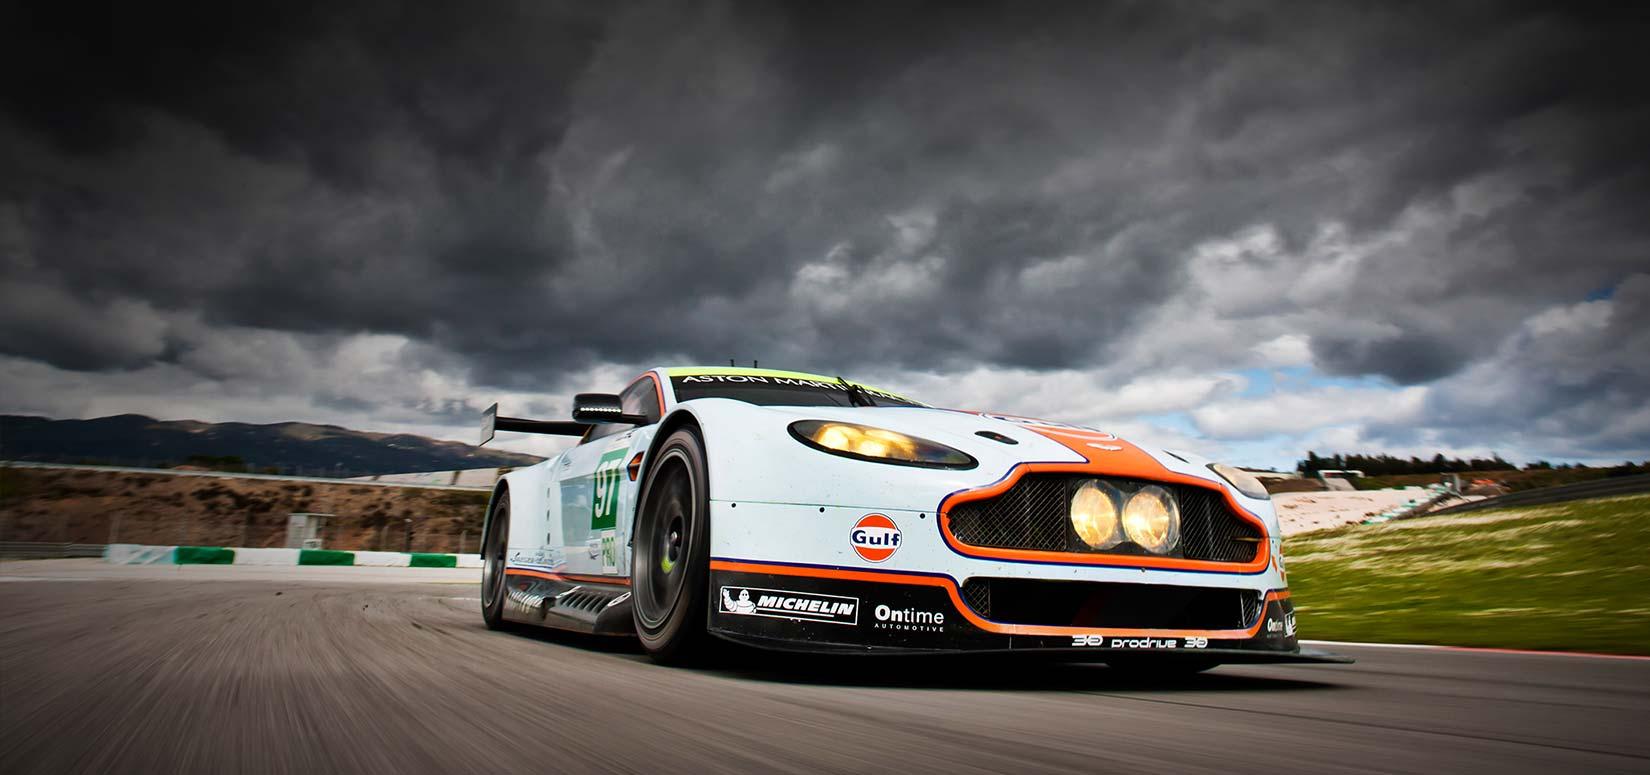 Thunderhill Race Car Wallpaper: Racing Desktop Wallpaper